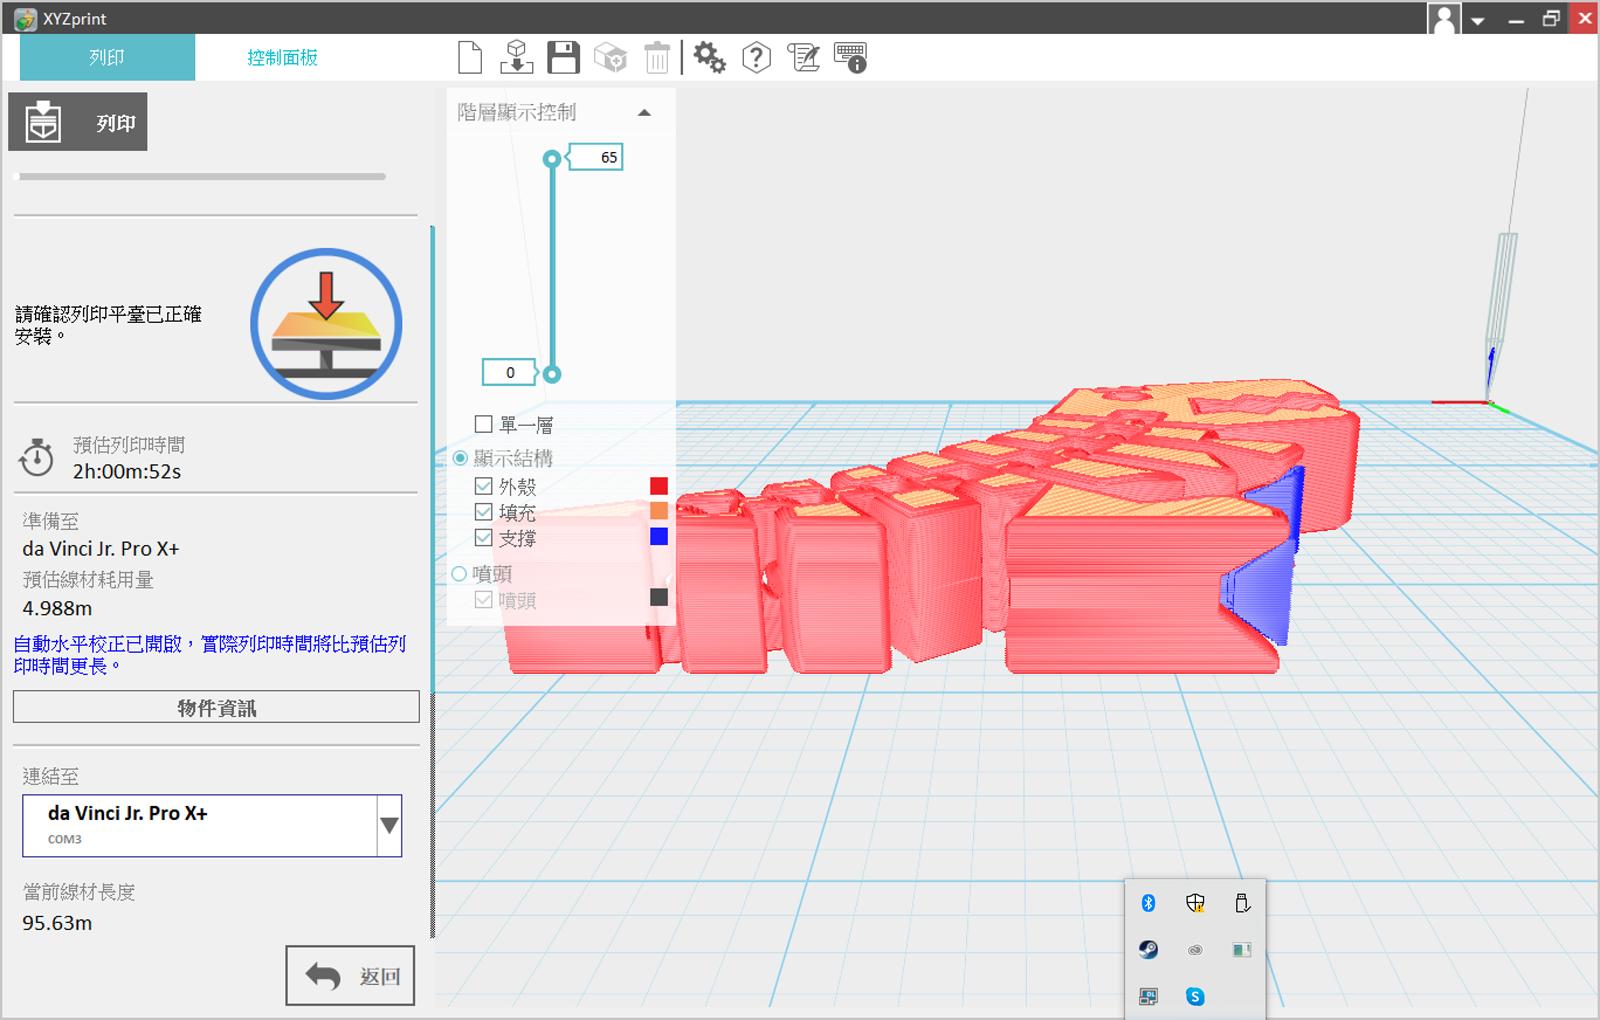 XYZprinting多功能3D列印機-da Vinci Jr. Pro X+,若使用官方線材可提供完整的線材預估、列印時間預測與列印過程模擬等完整功能